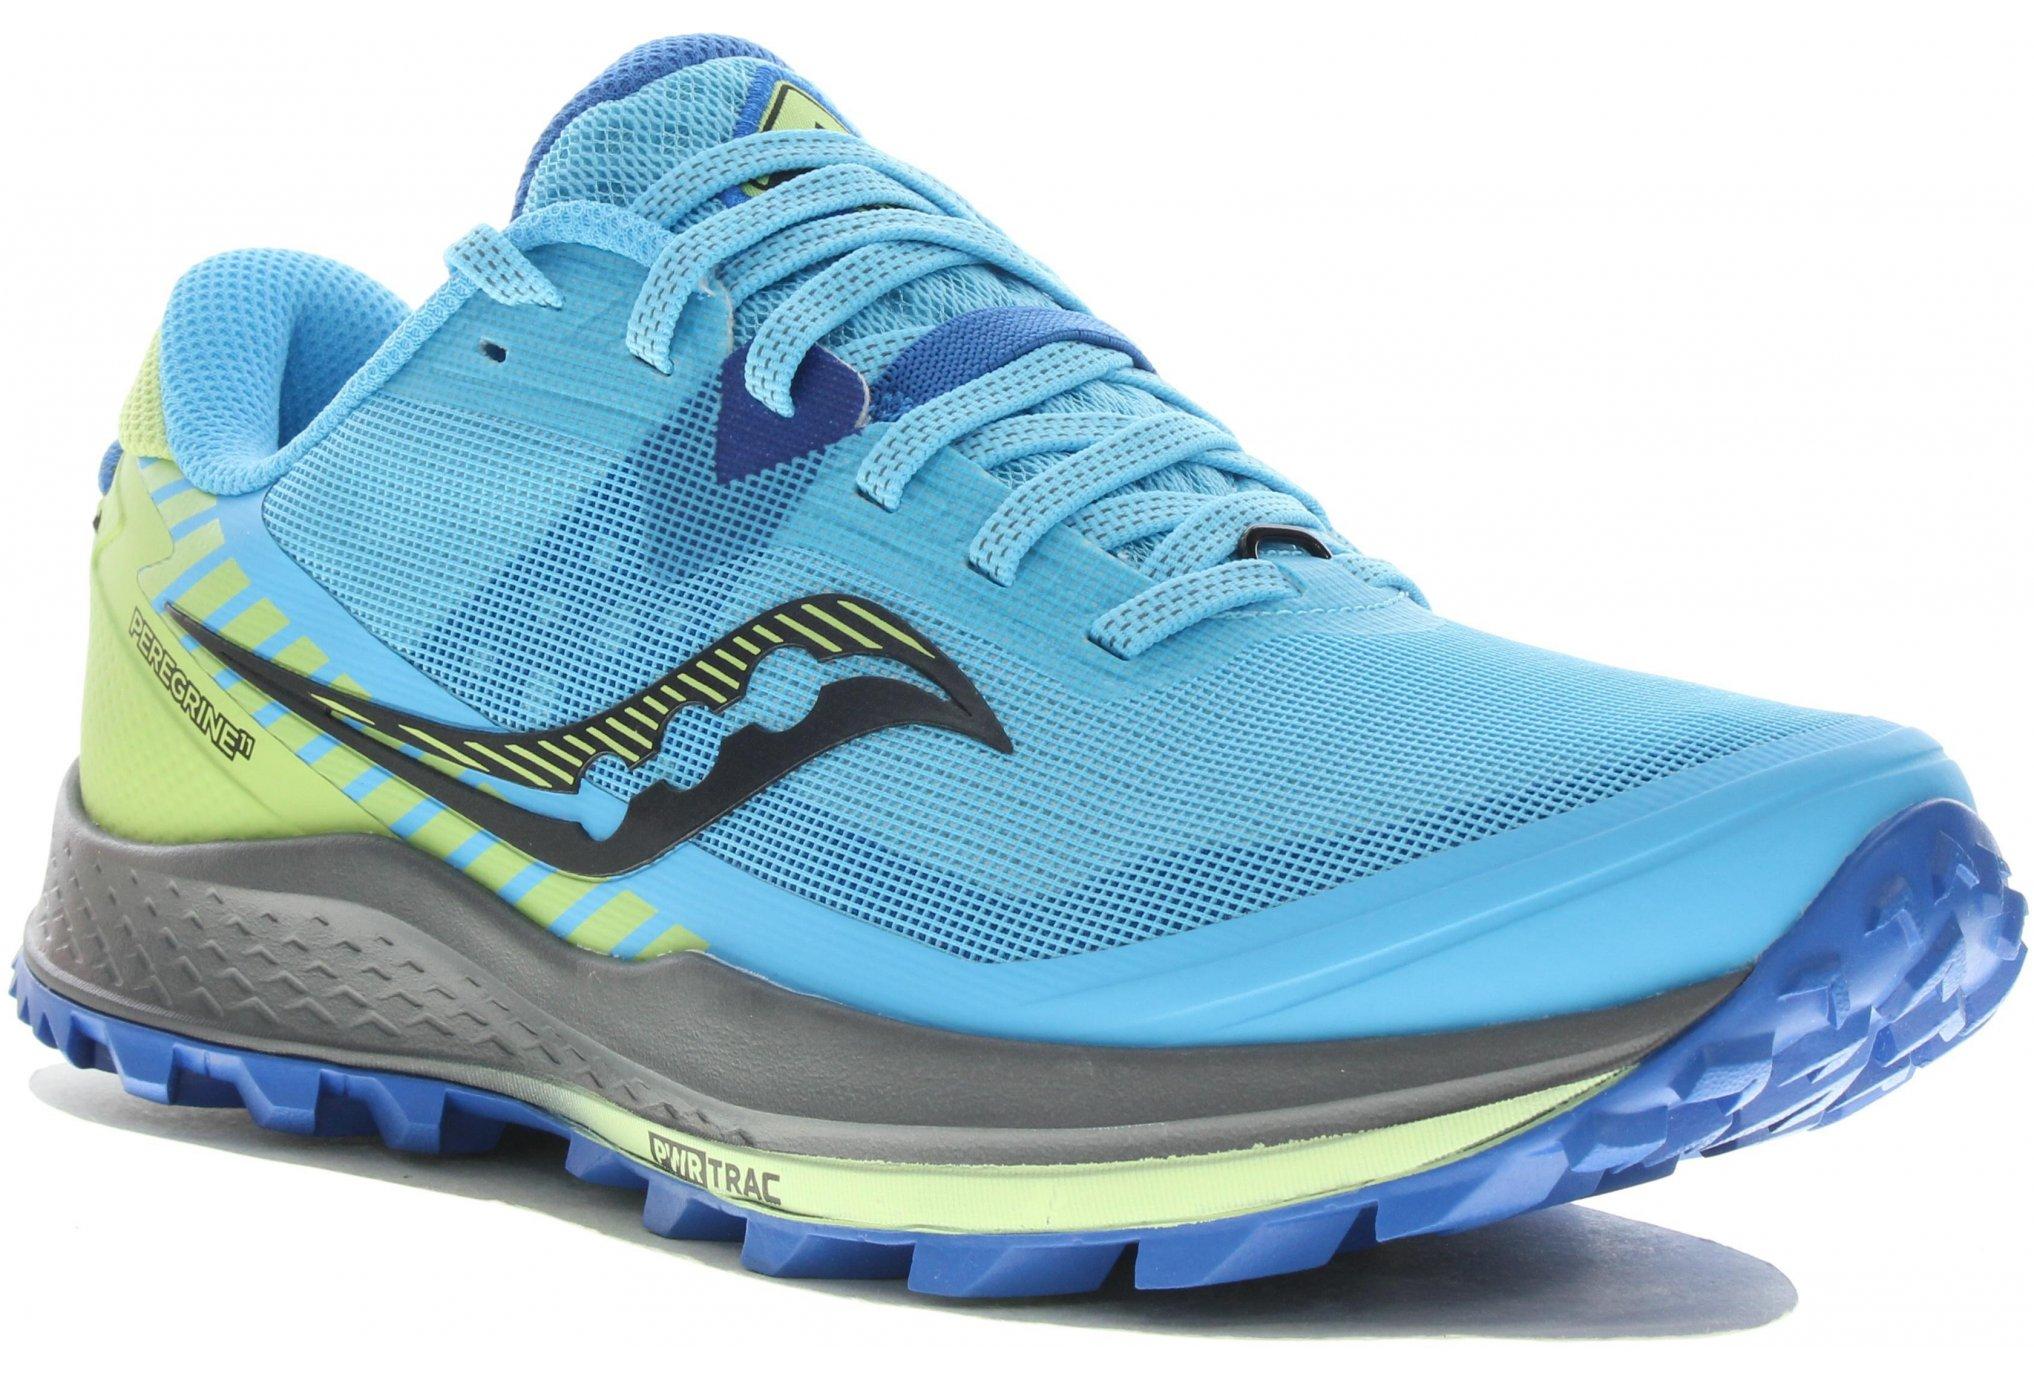 Saucony Peregrine 11 W Chaussures running femme